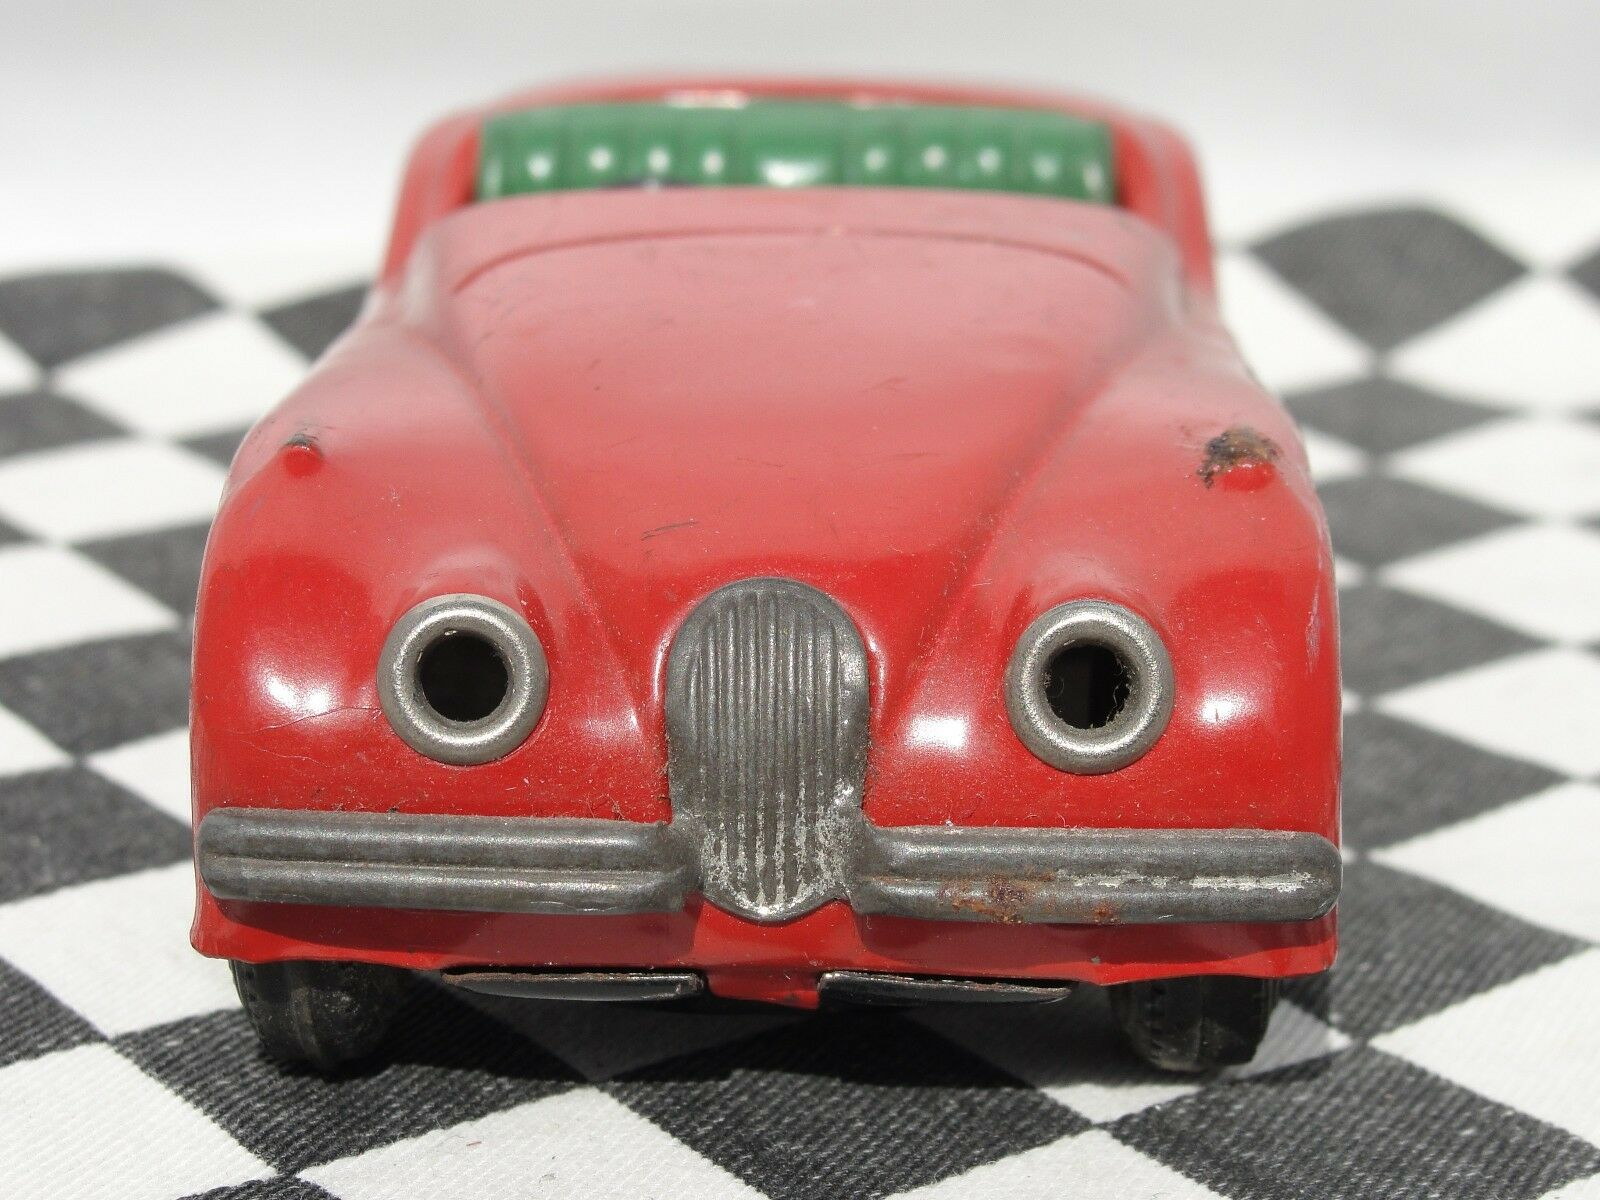 MINIMODELS 1950'S TINPLATE JAGUAR XK120 XK120 XK120  RED USED UNBOXED c264d1